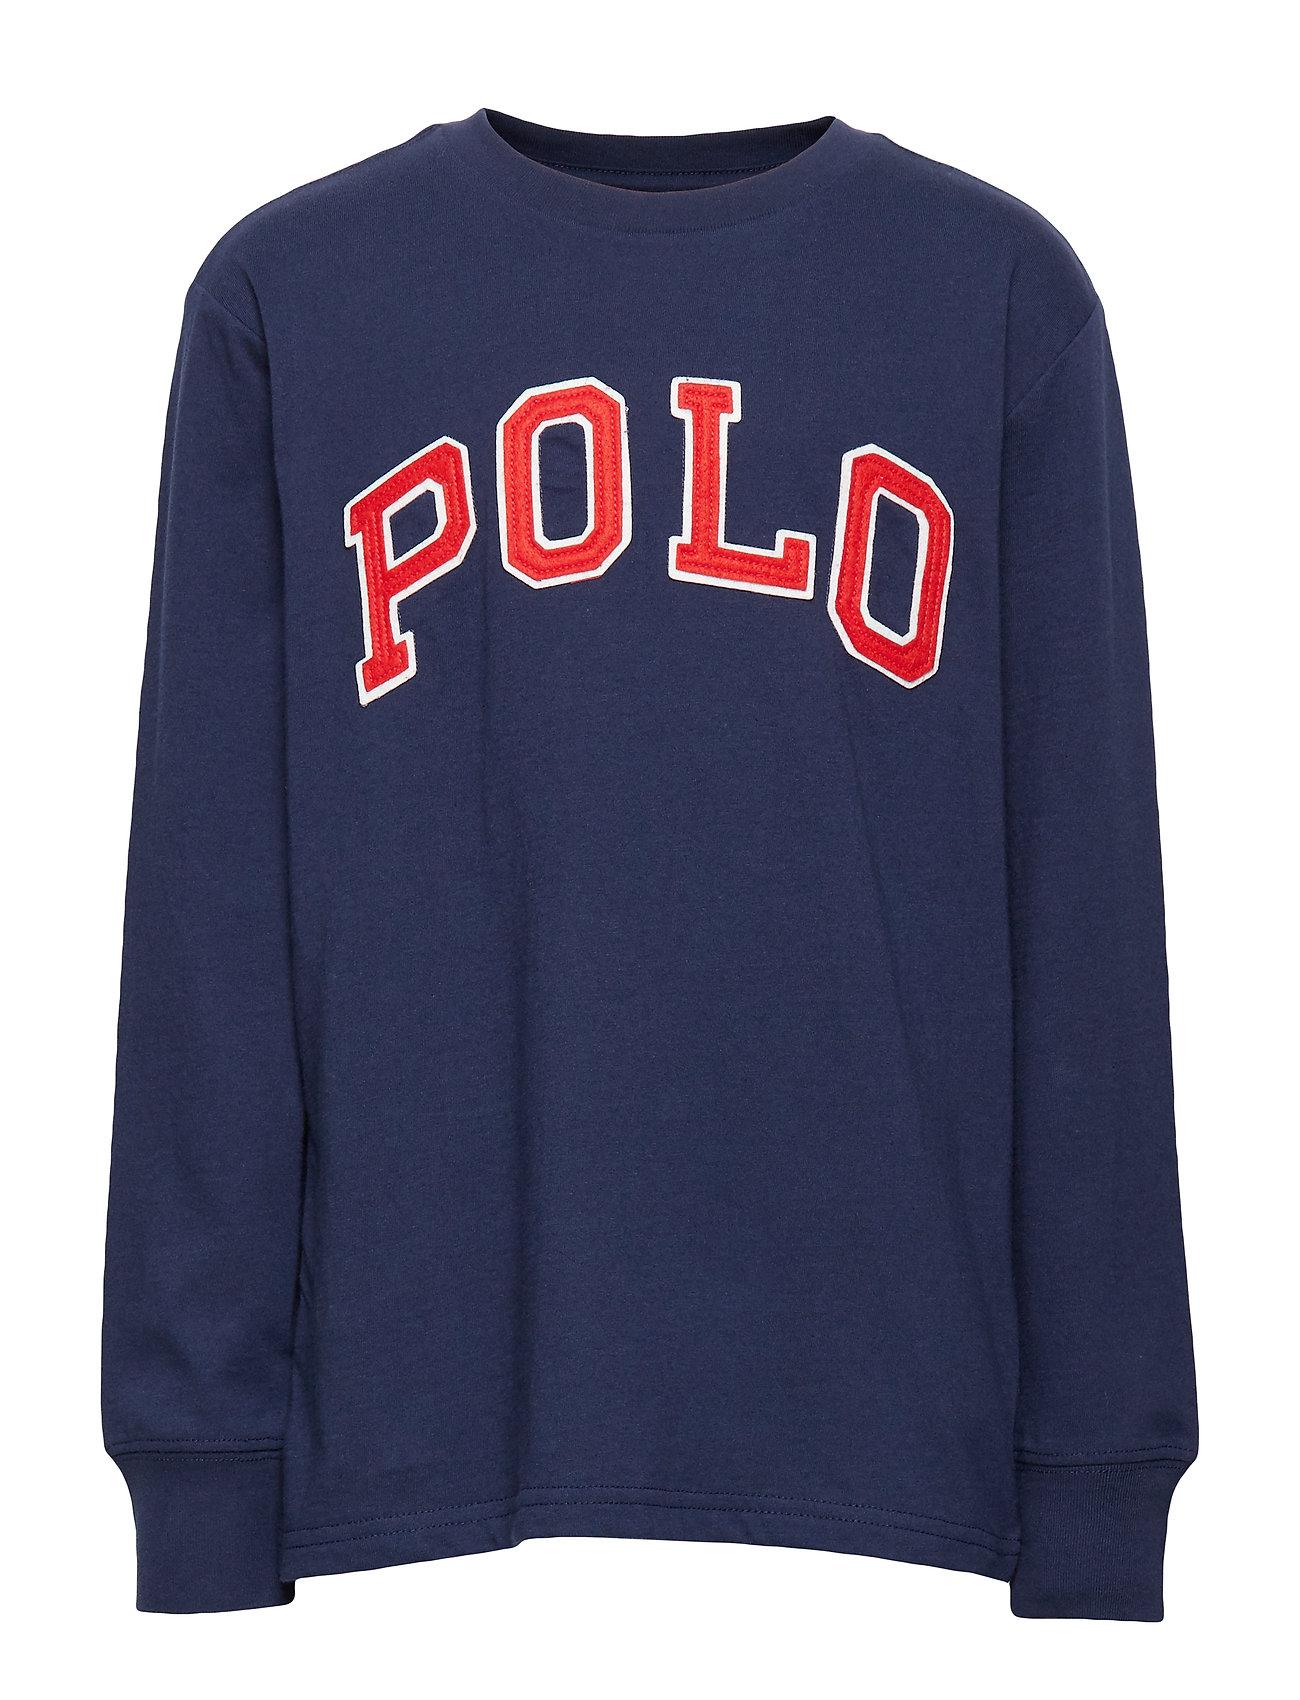 Ralph Lauren Kids Polo Cotton Jersey Tee - FRENCH NAVY